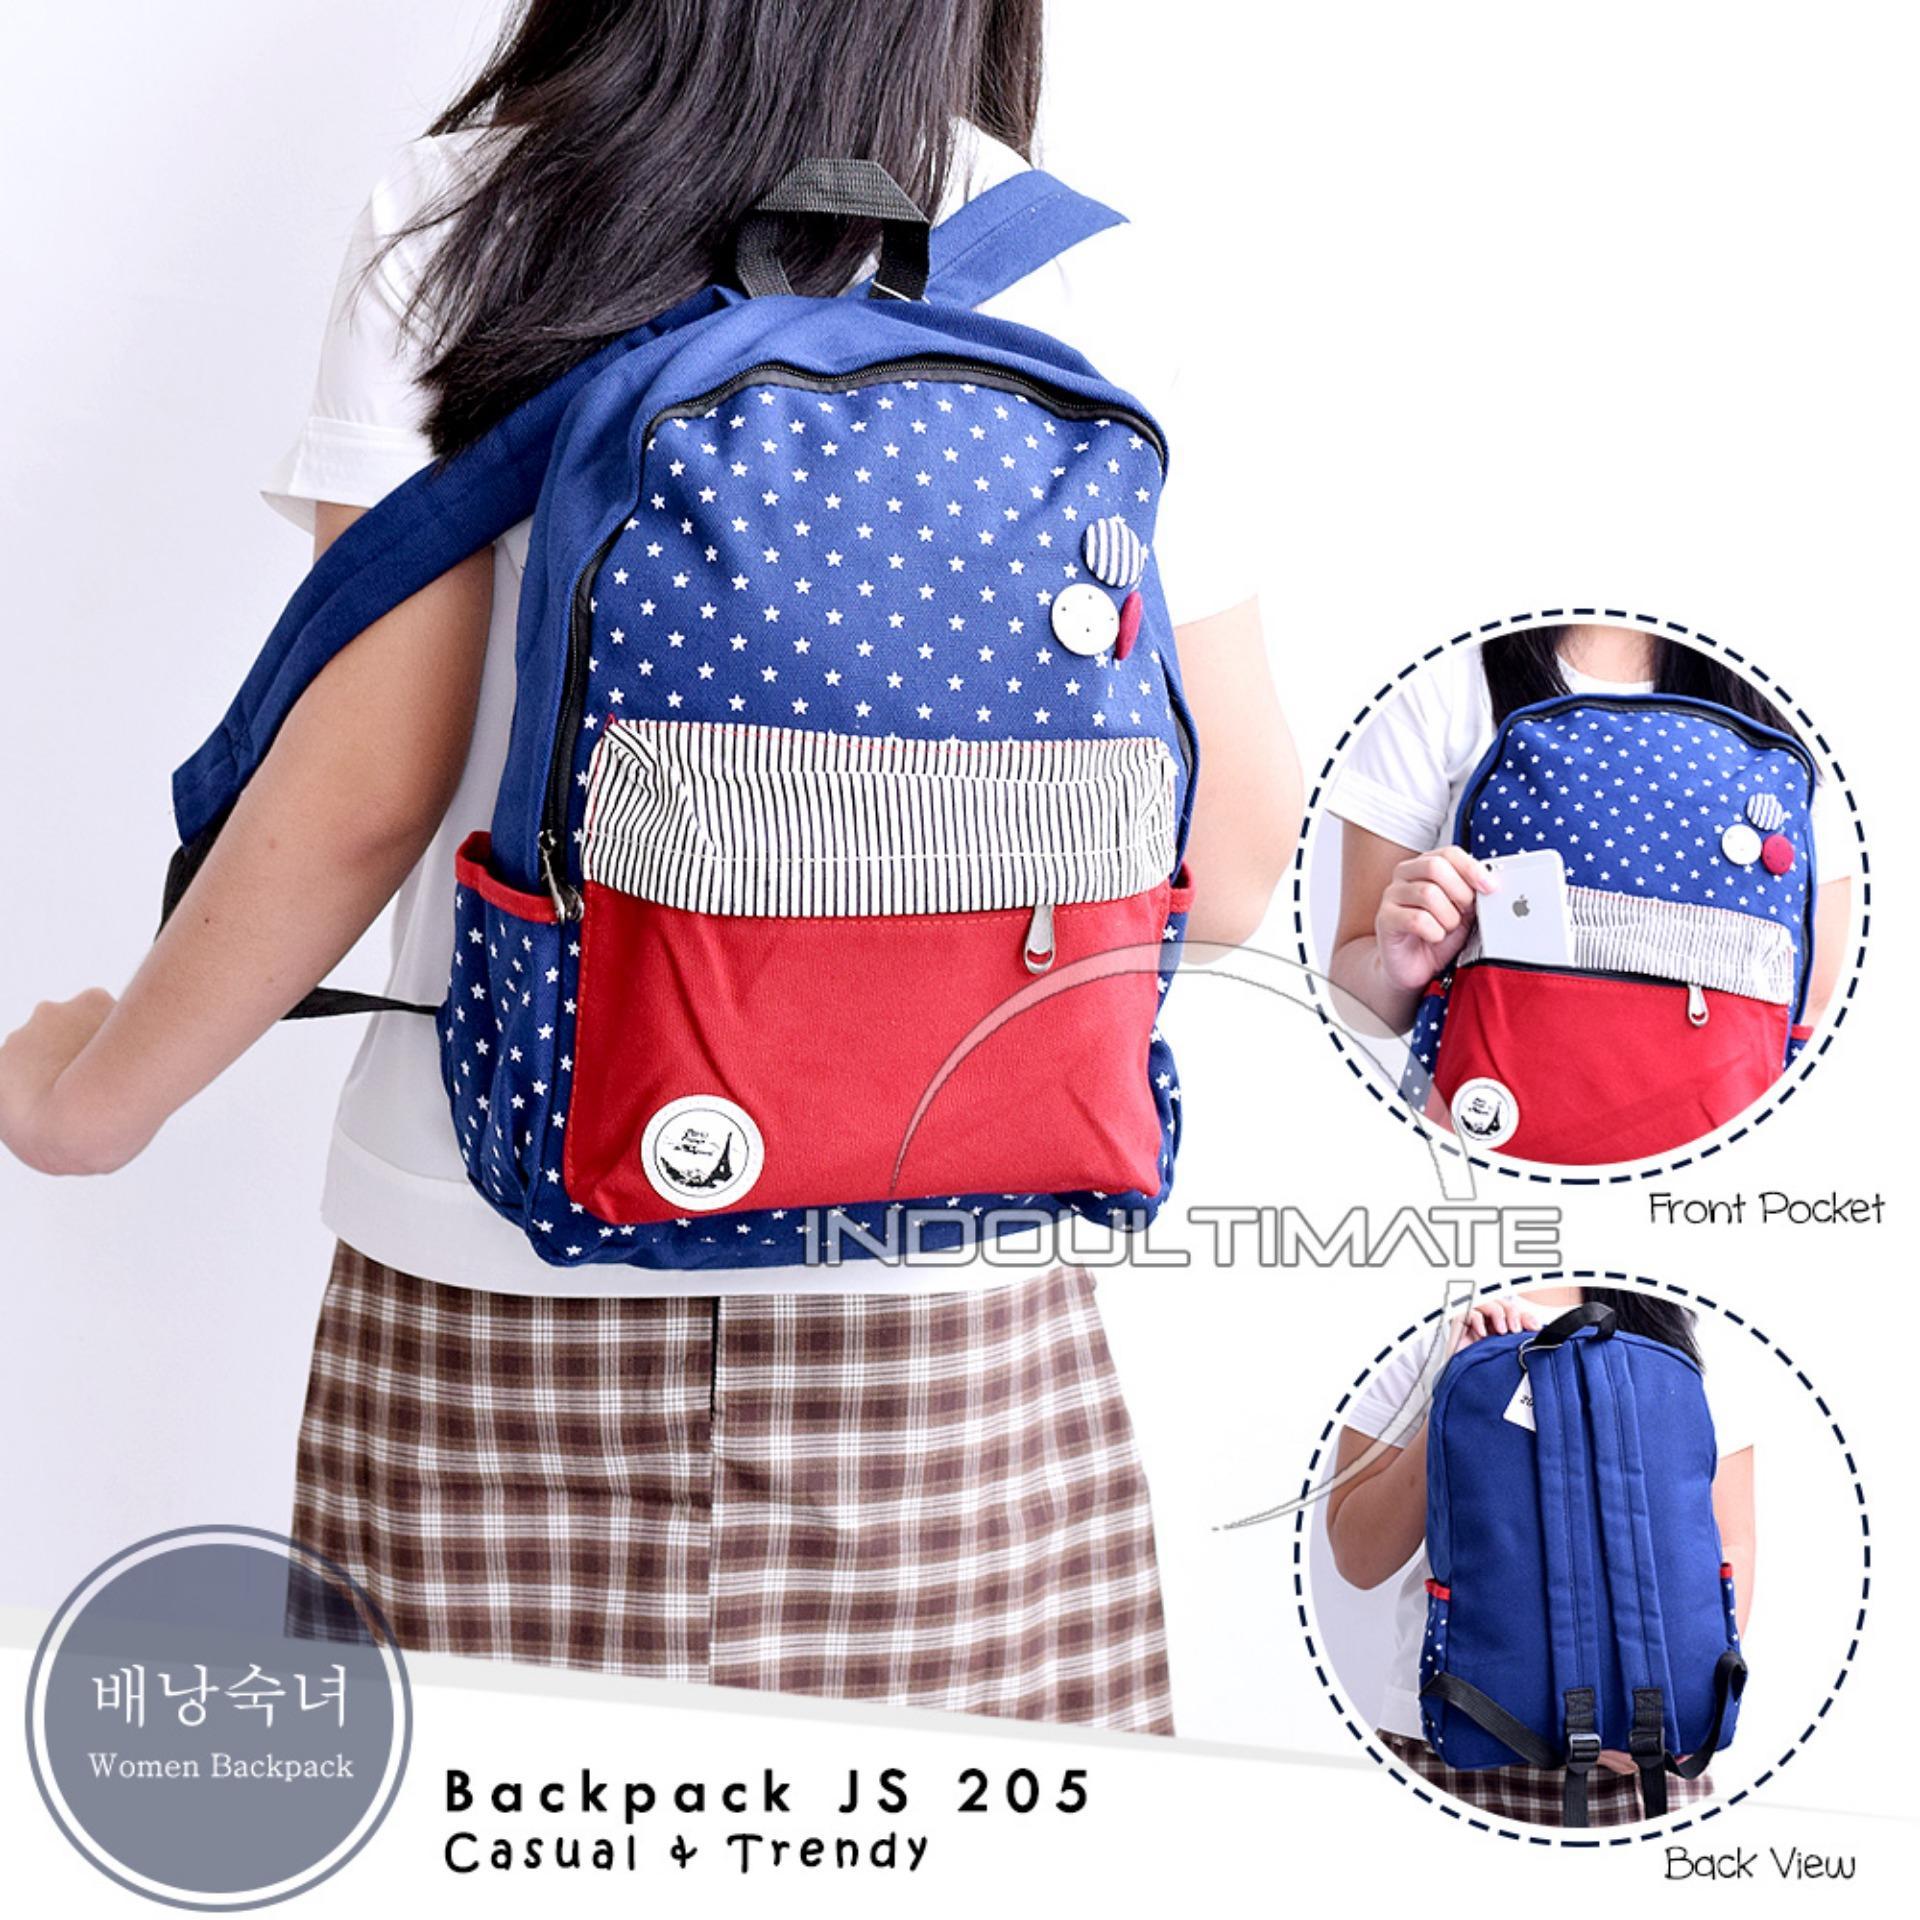 Ulasan Lengkap Tas Ransel Kanvas Tas Backpack Kanvas Tas Sekolah Tas Kuliah Im Js 205 Backpack